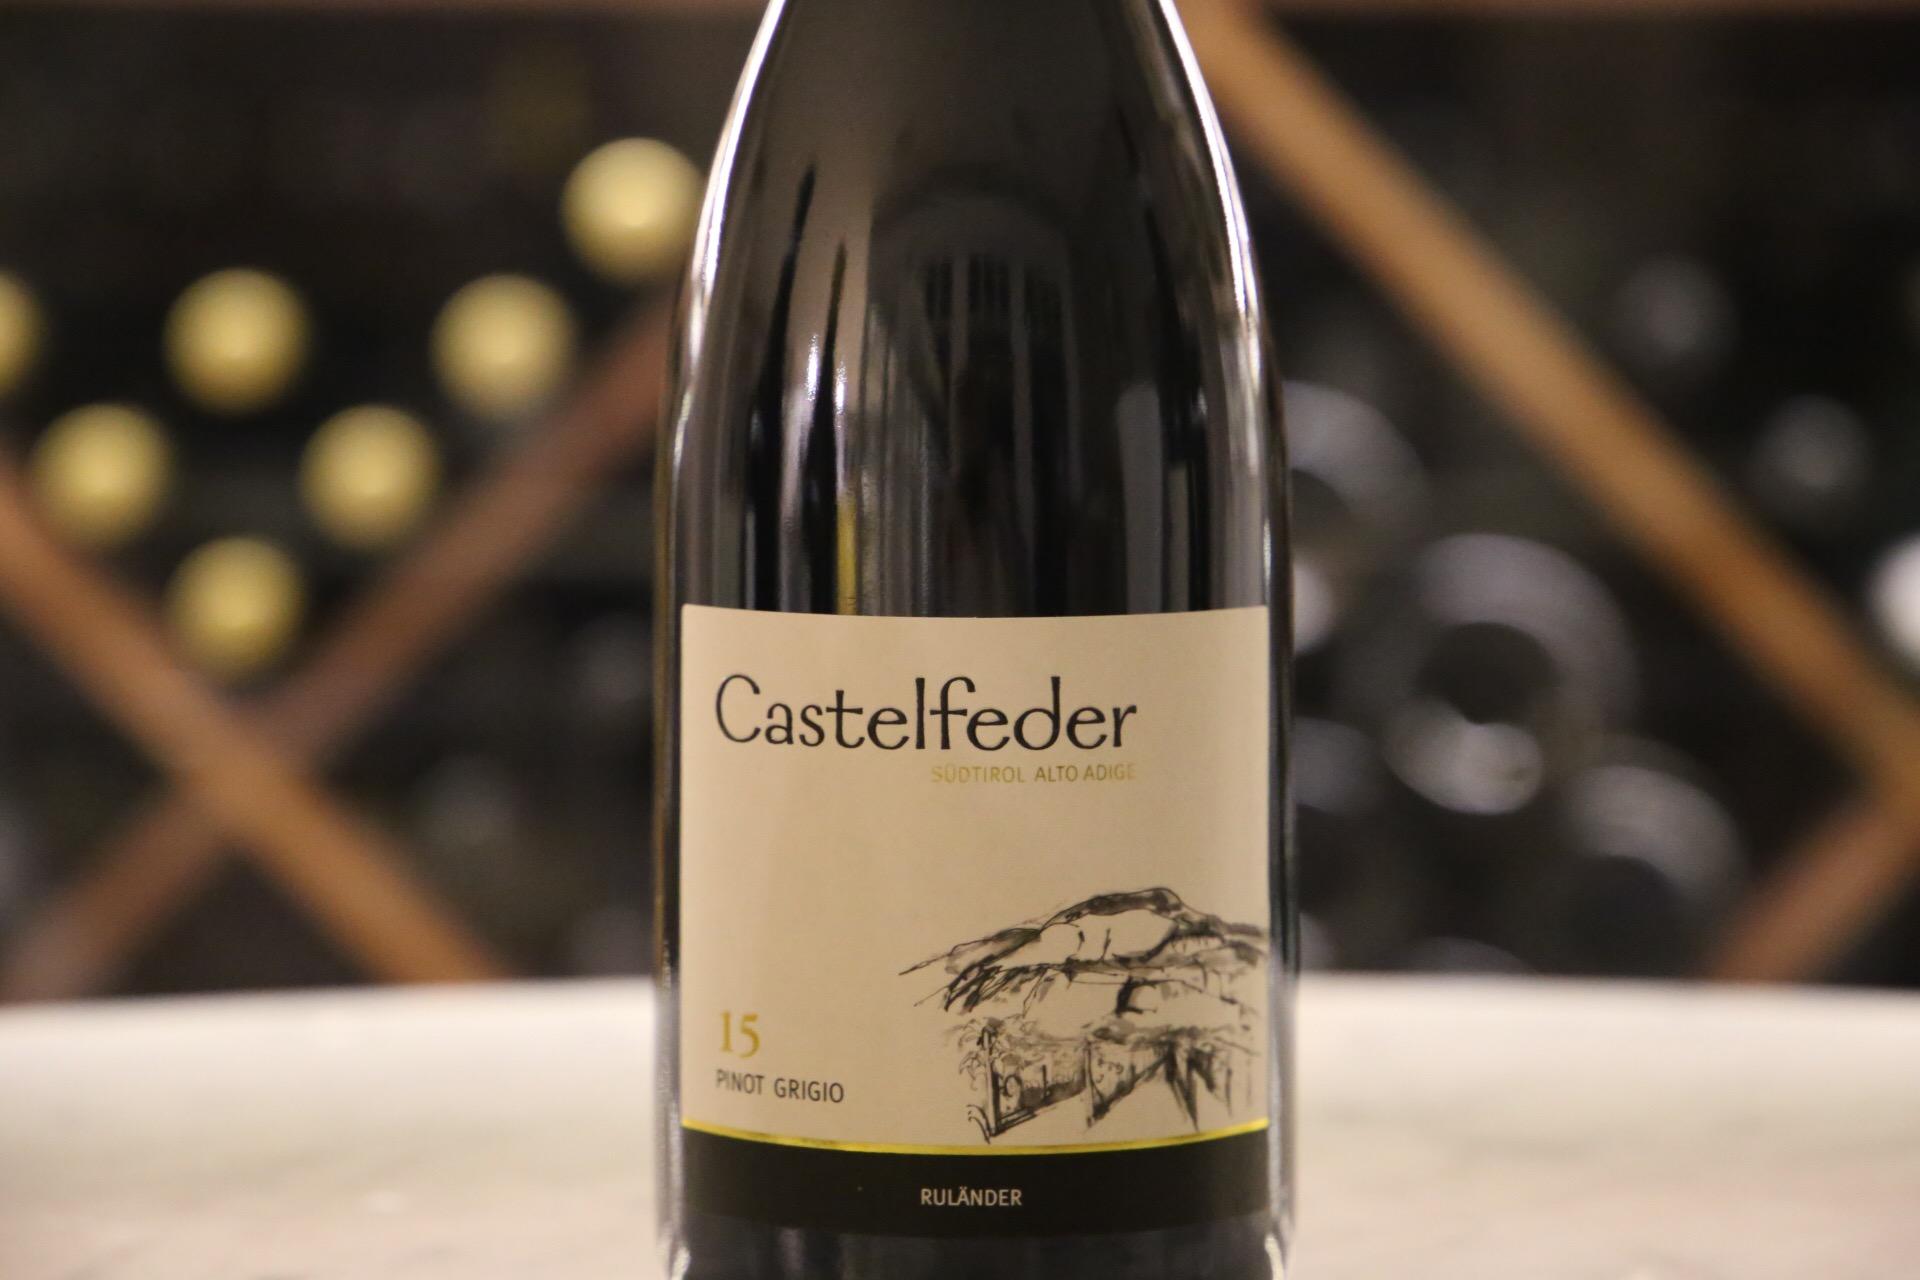 Castelfeder Bottle shot.JPG